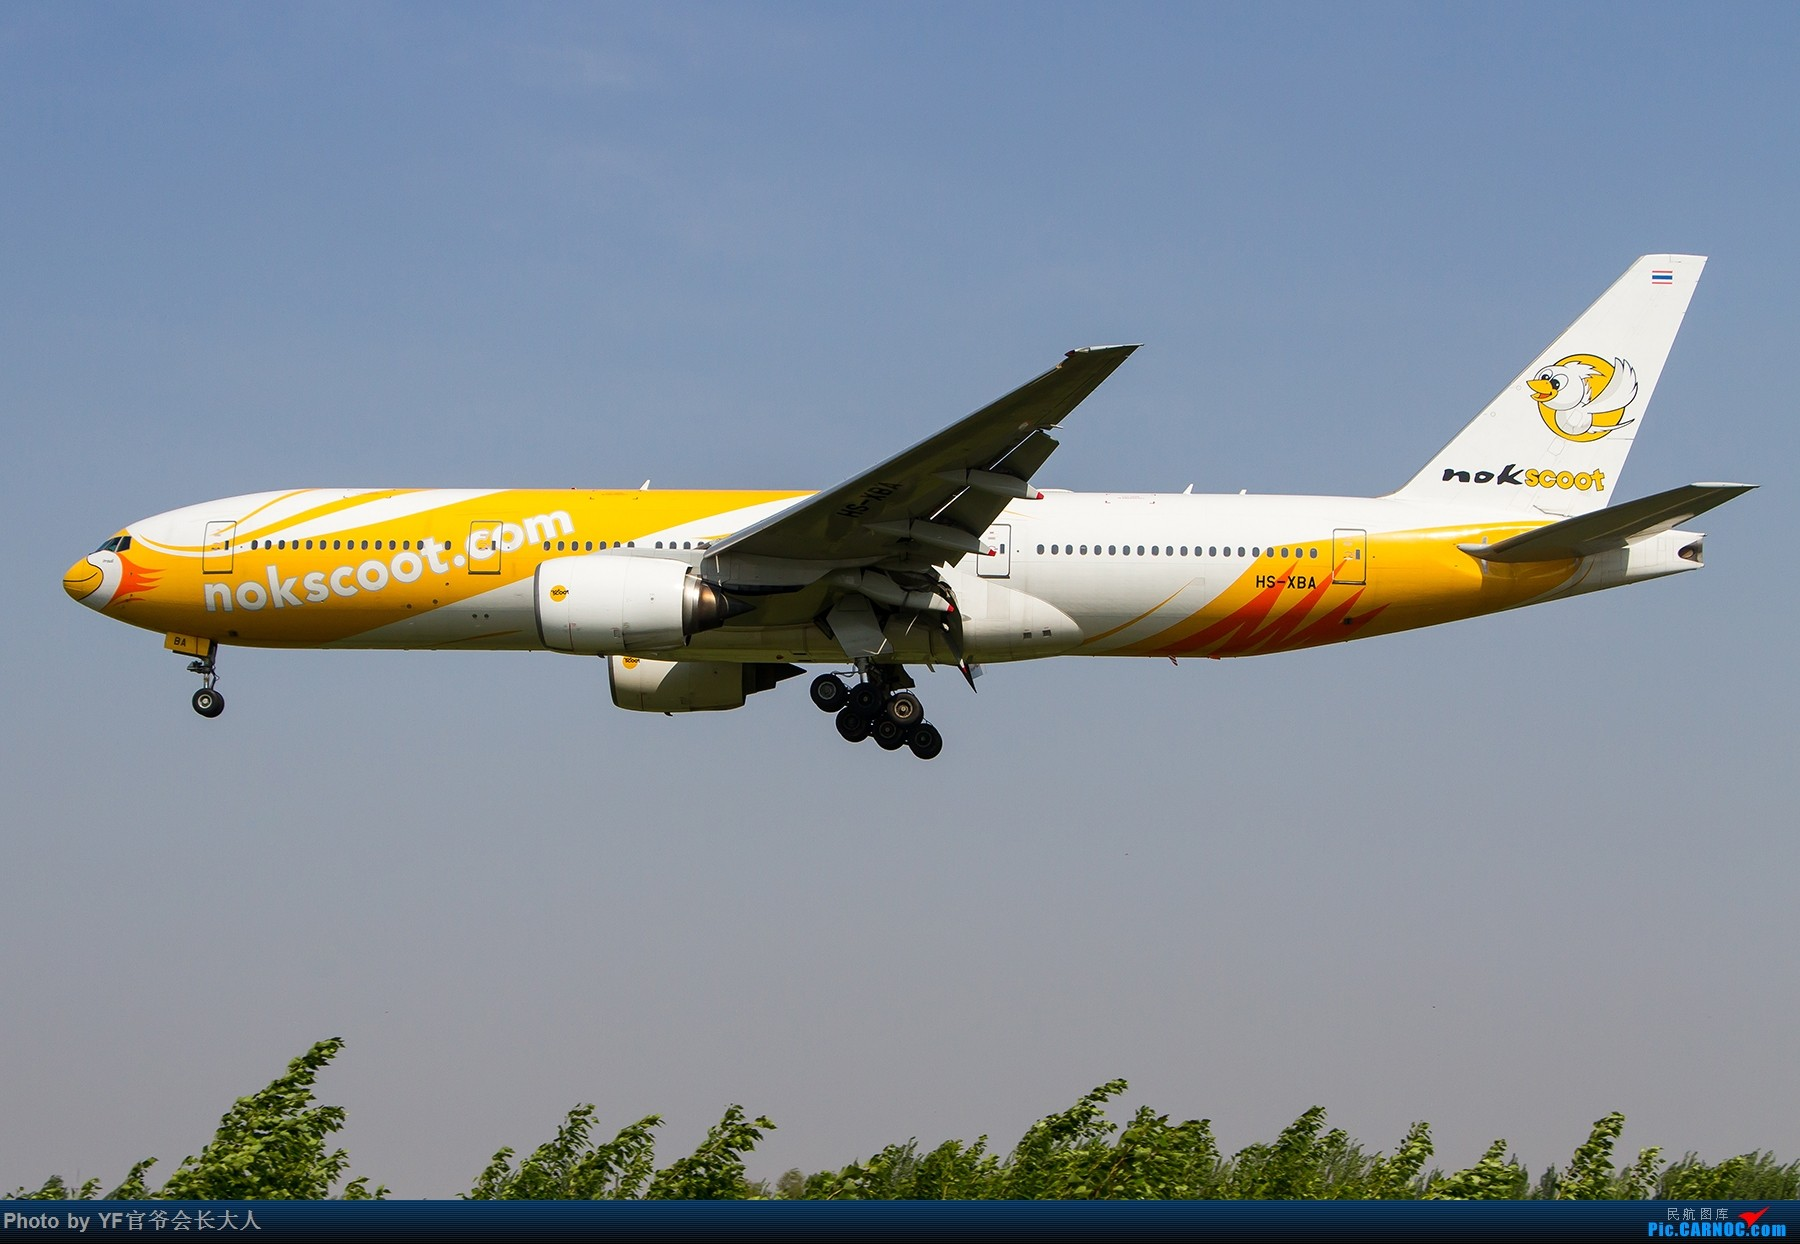 Re:[原创]【ZYTX】轻易不拍机,拍就要拍个过瘾!(新开的酷鸟,亚洲大西洋,顺带碰上朝韩两国的好货) BOEING 777-200ER HS-XBA 中国沈阳桃仙国际机场